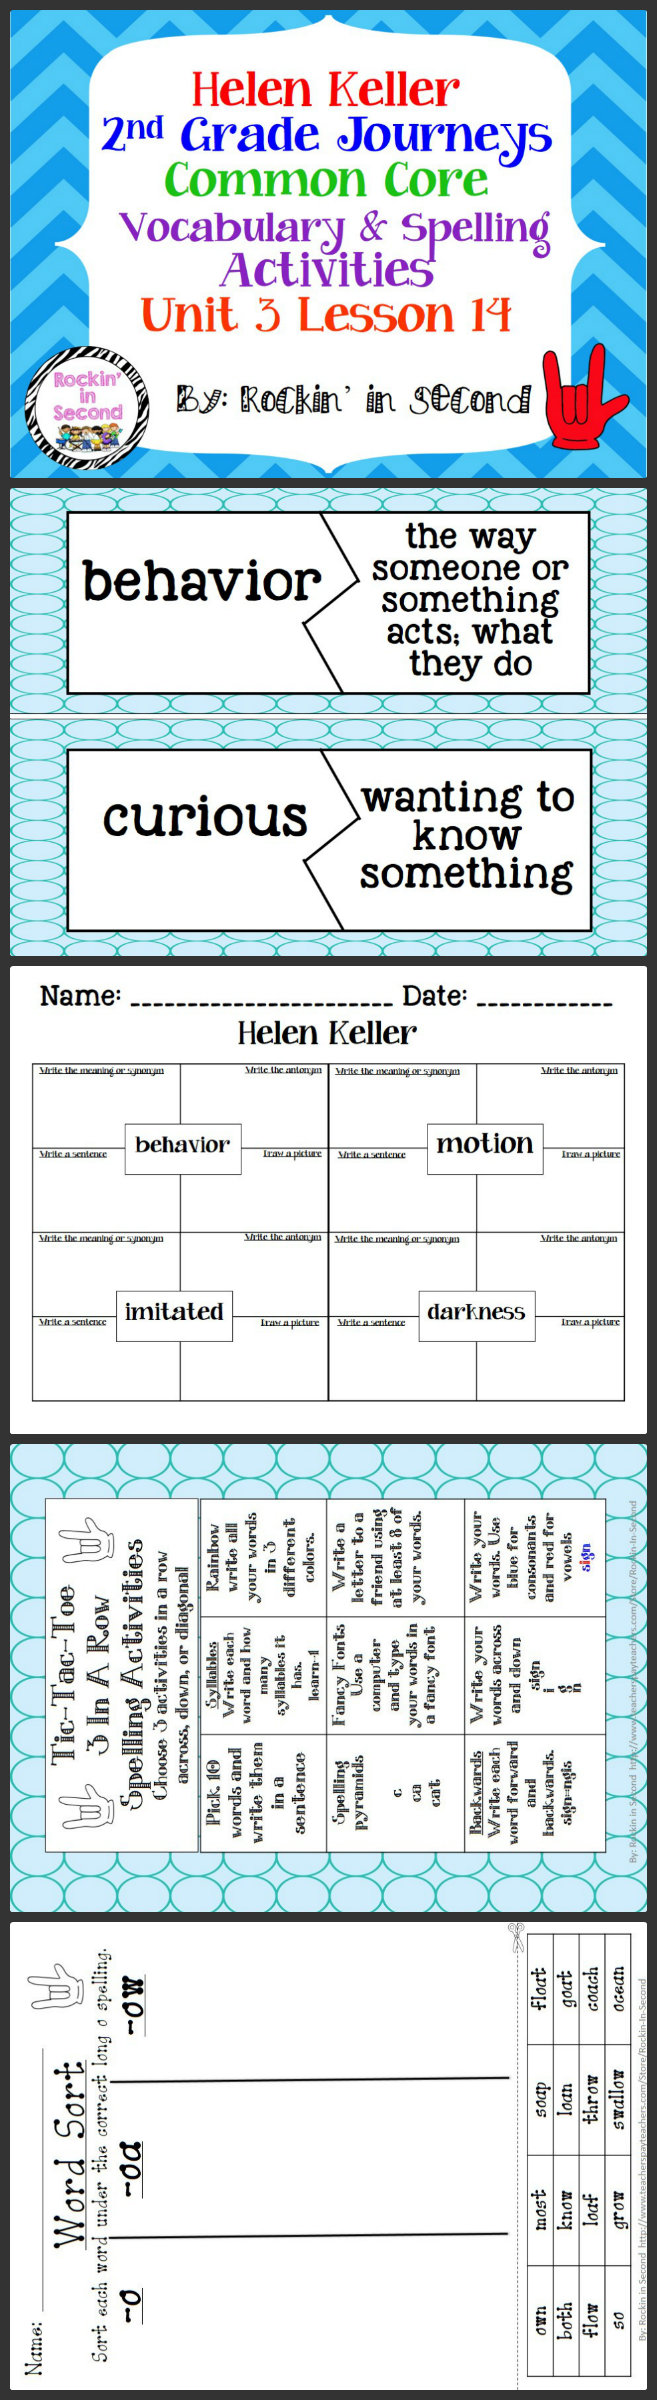 Preposition In Learn In Marathi All Complate: Journeys Helen Keller Spelling & Vocab. Activities Lesson